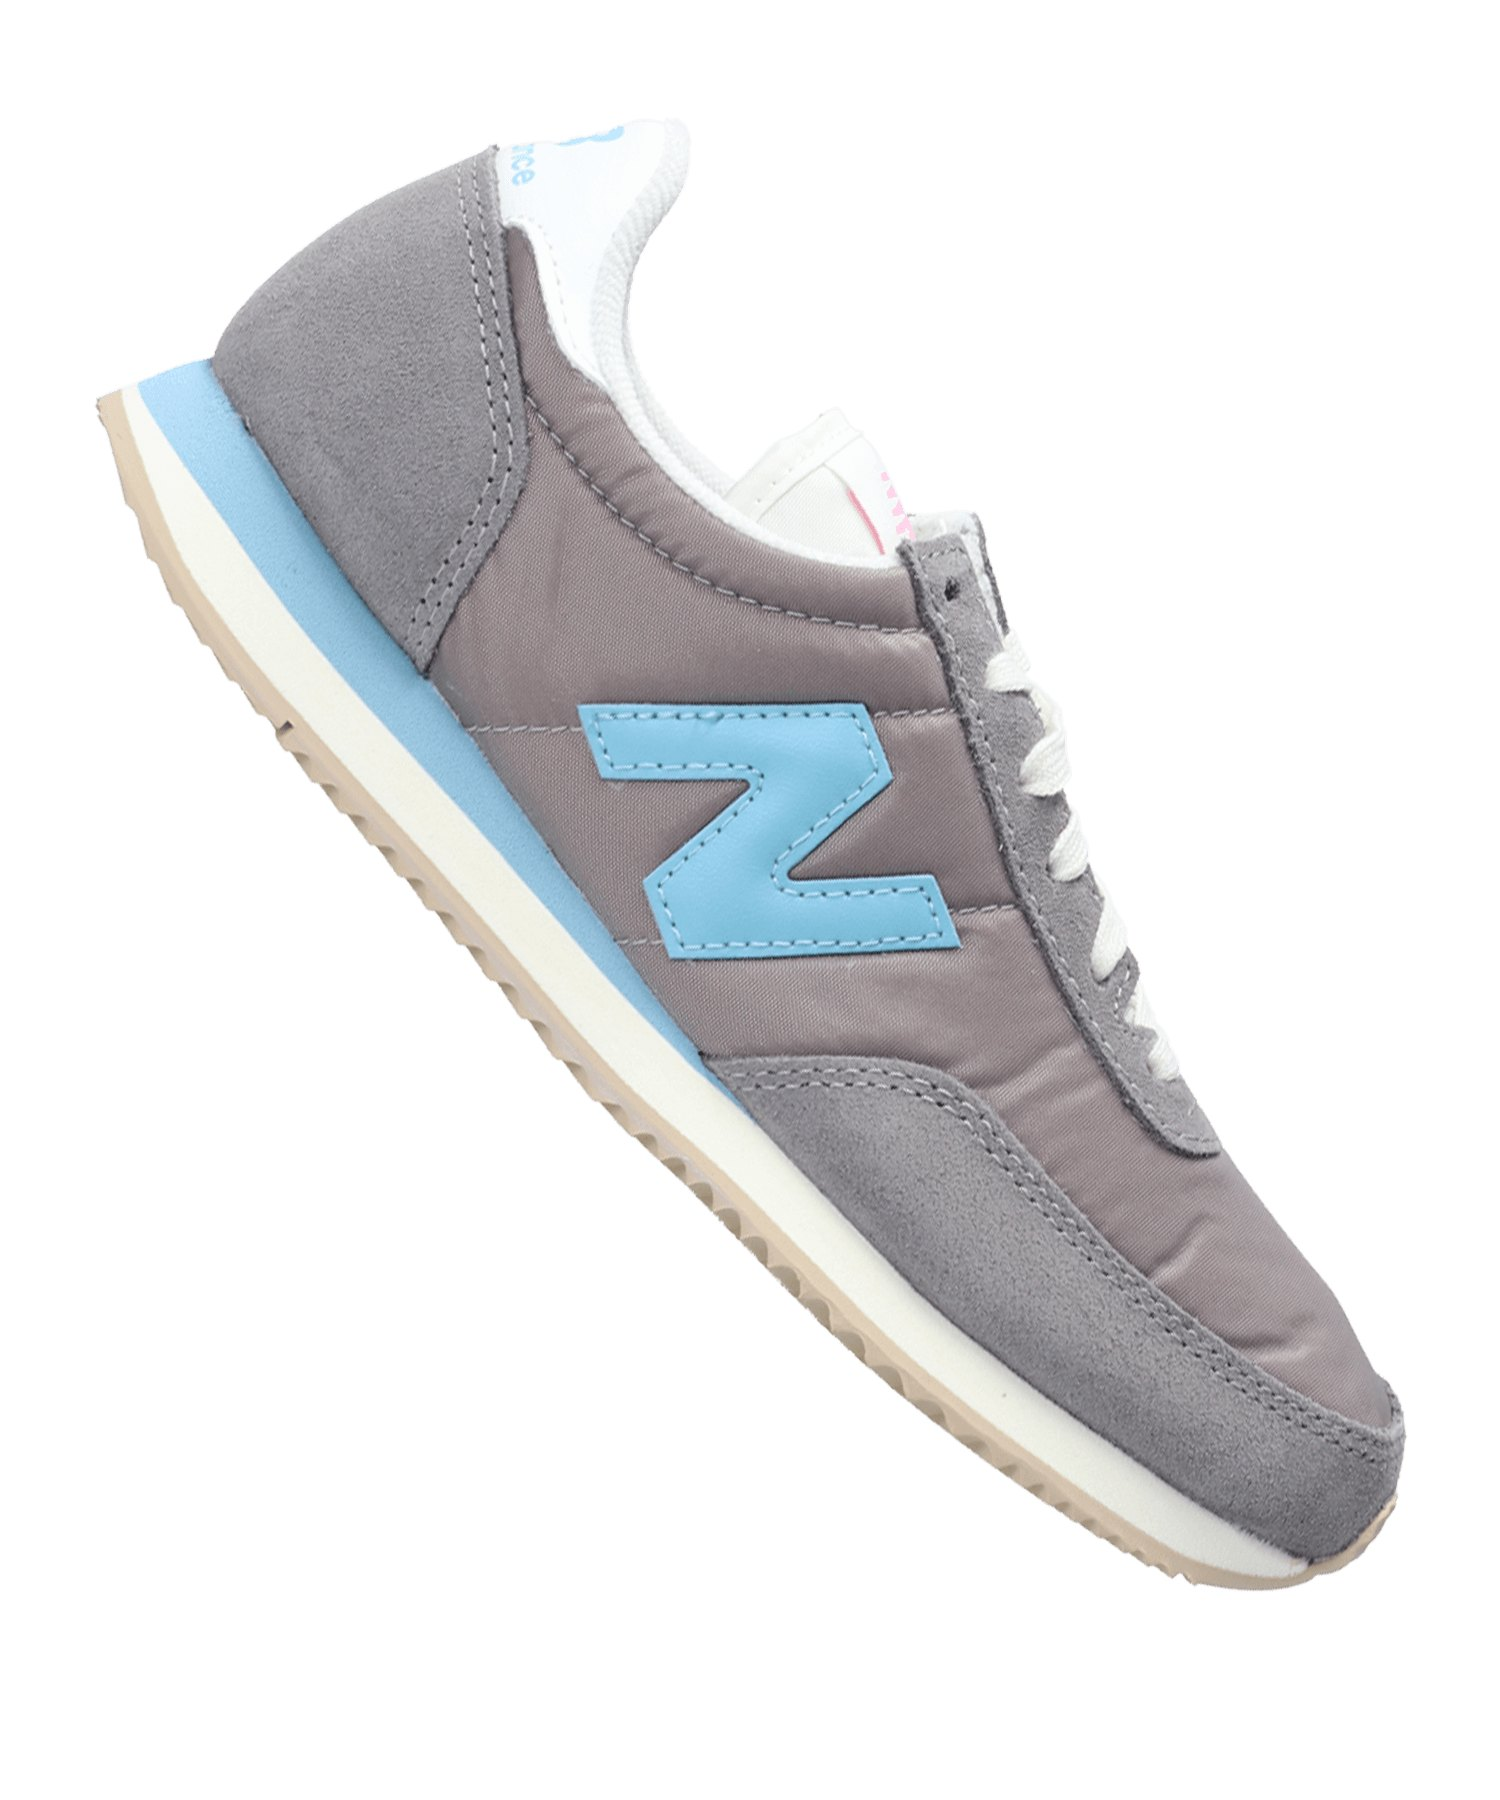 New Balance WL720 B Sneaker Damen Grau F12 - grau